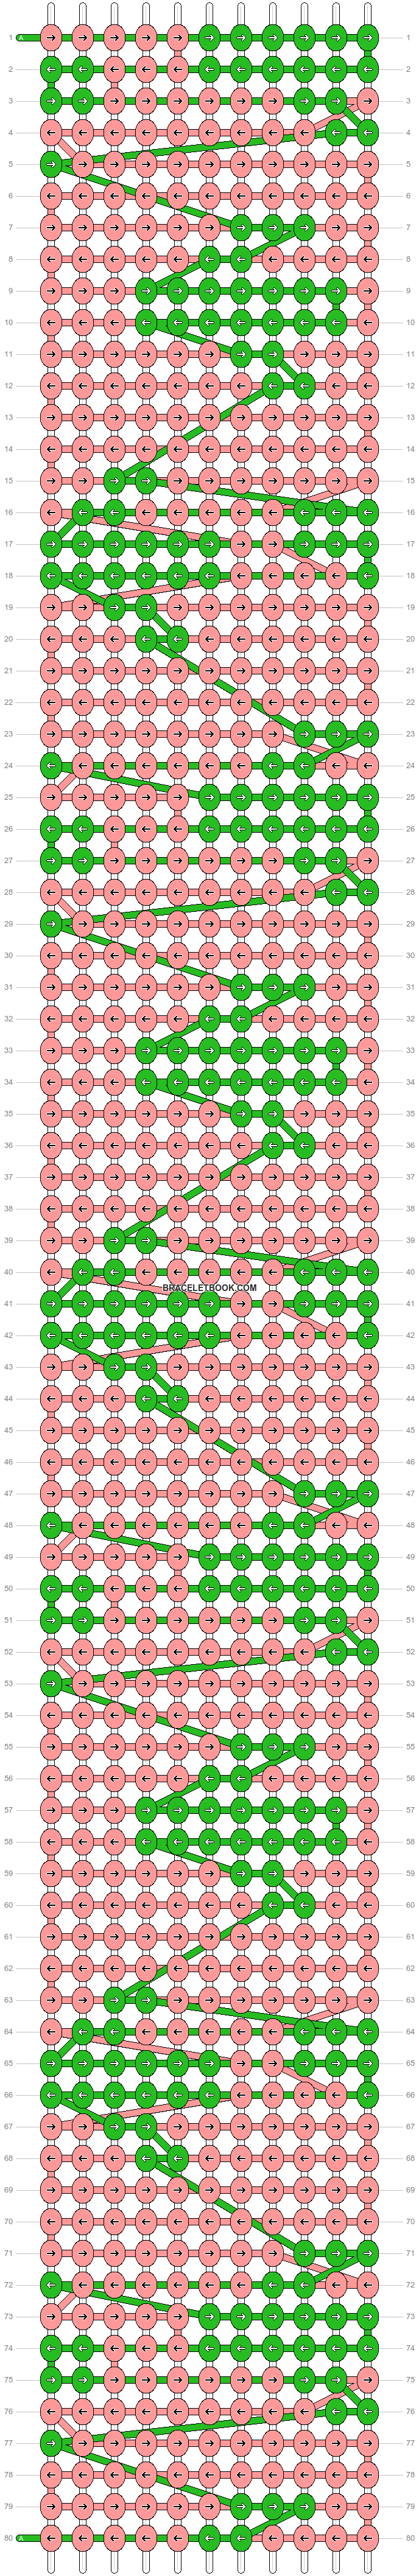 Alpha pattern #21041 variation #50137 pattern